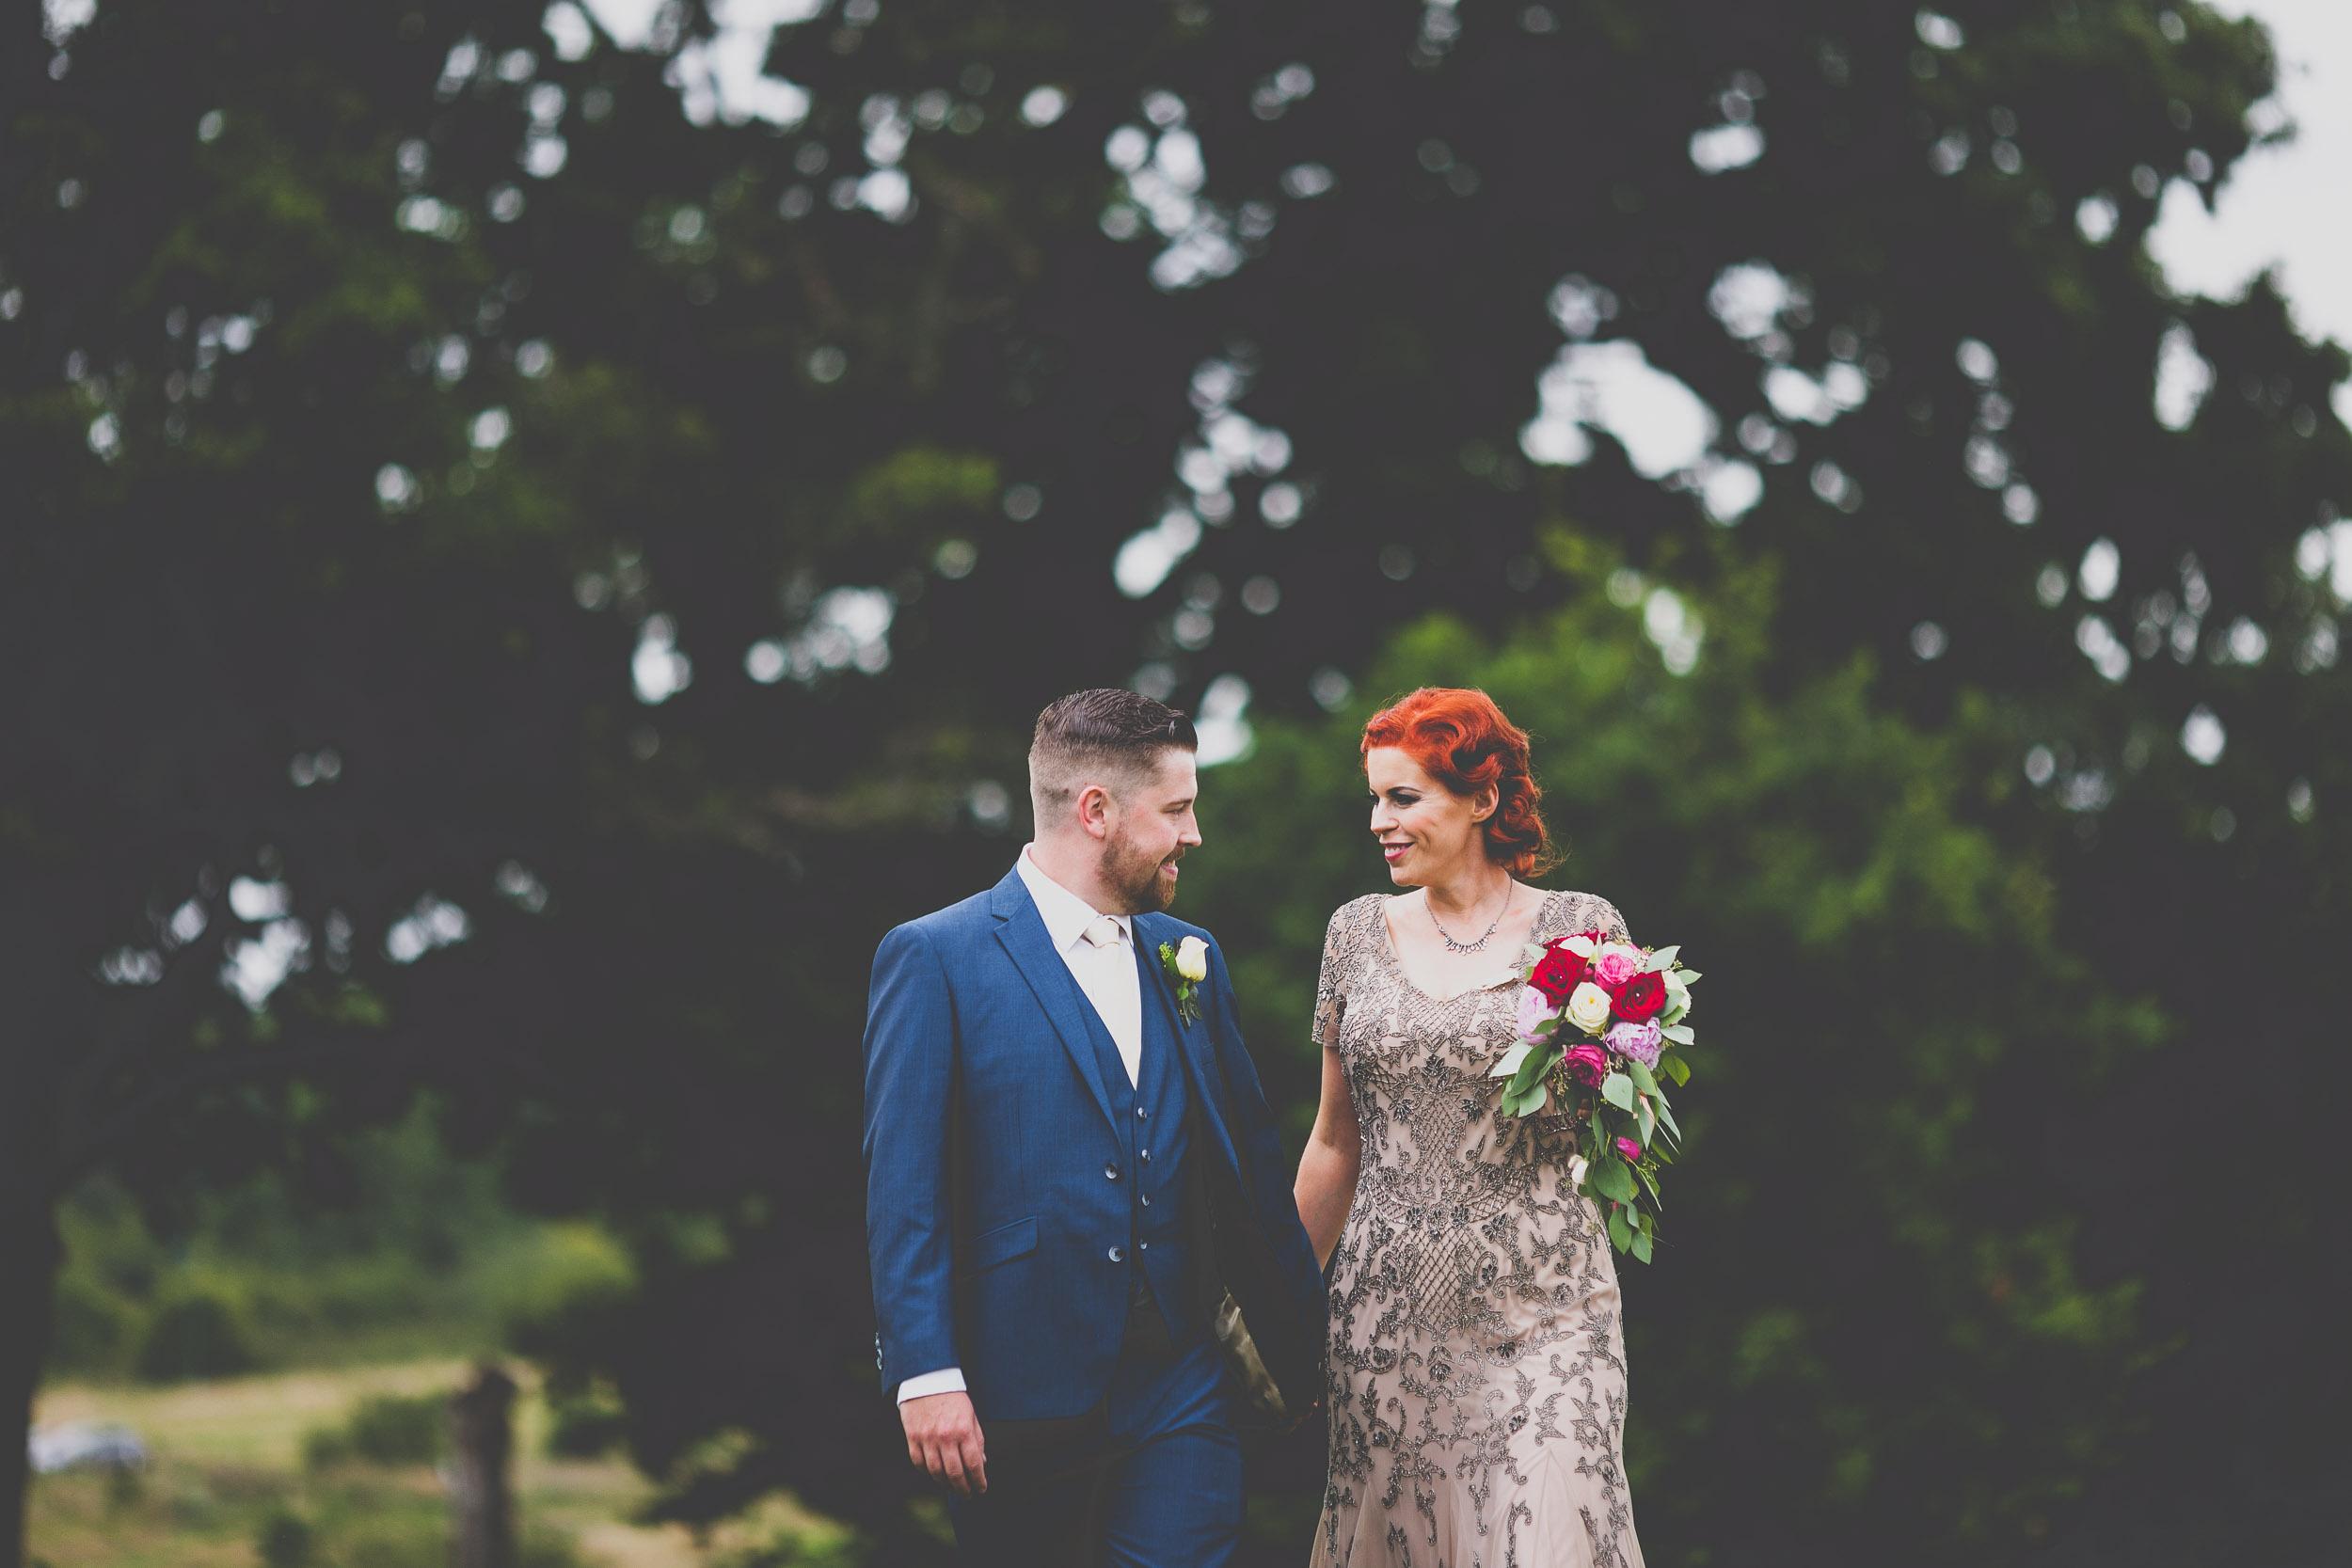 queen-elizabeths-hunting-lodge-epping-forest-wedding203.jpg